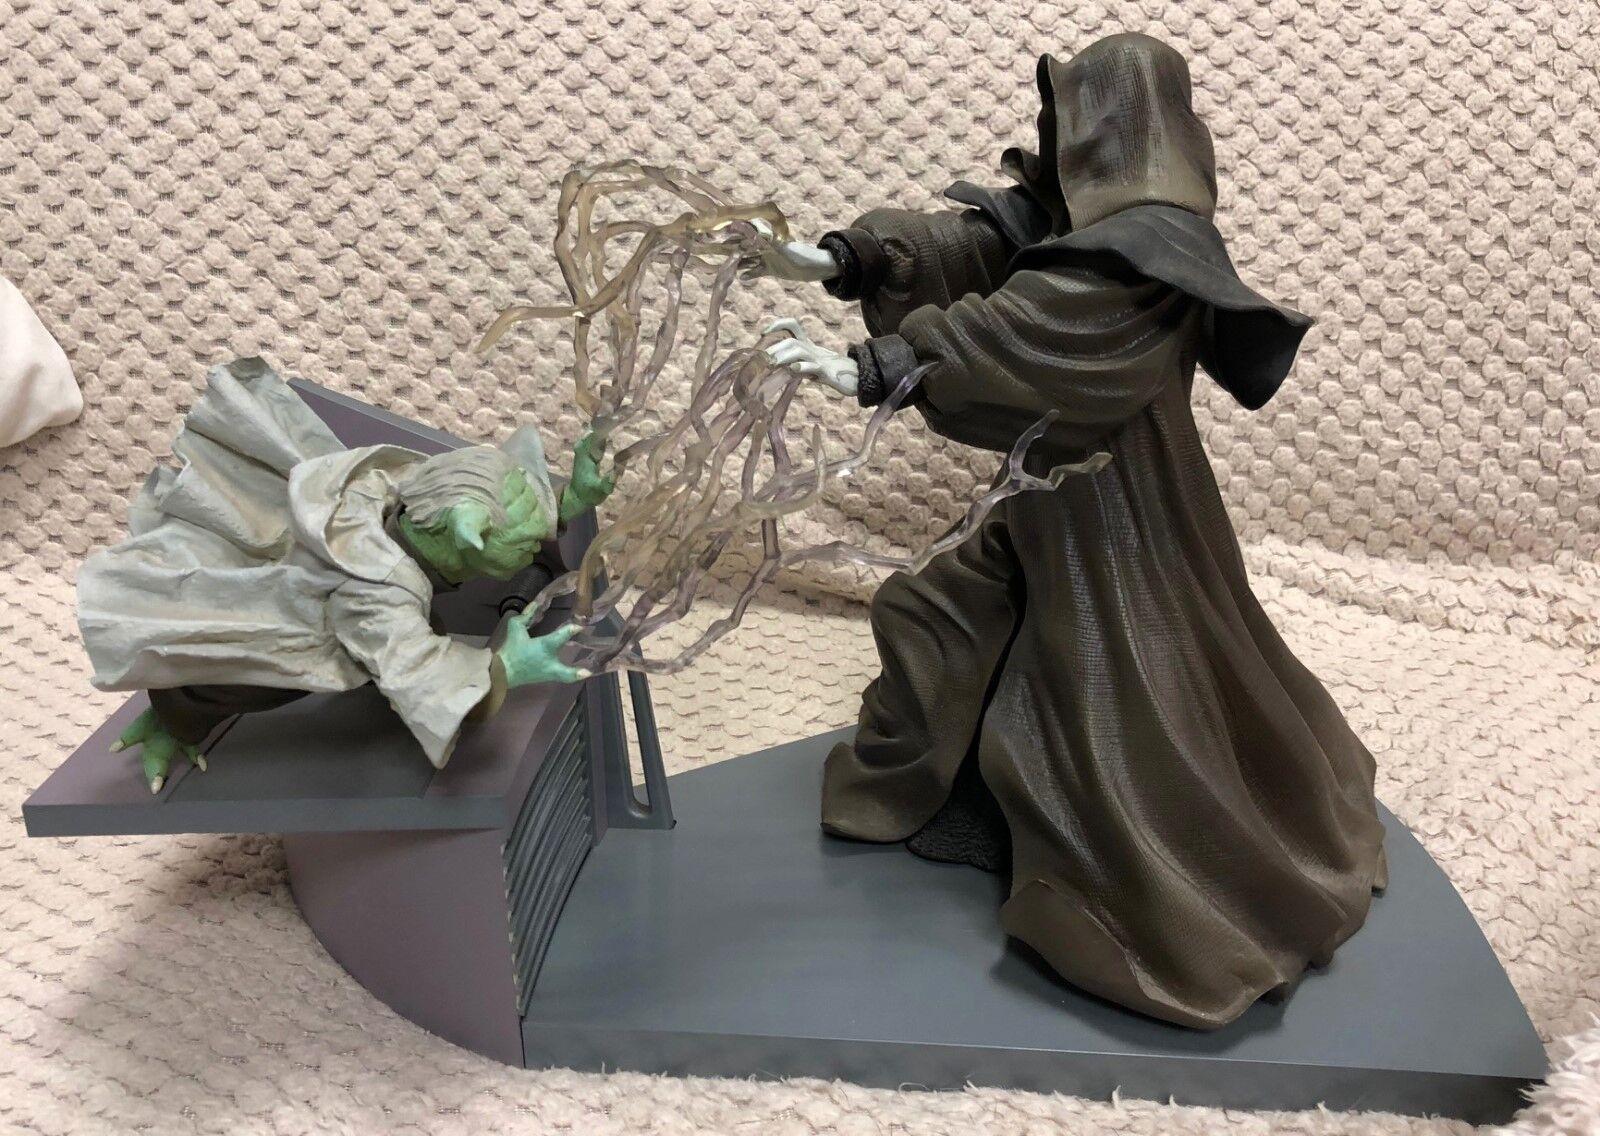 1 7 Star Wars Episode III Yoda versus Palpatine figures by Kotobukiya KSW-31